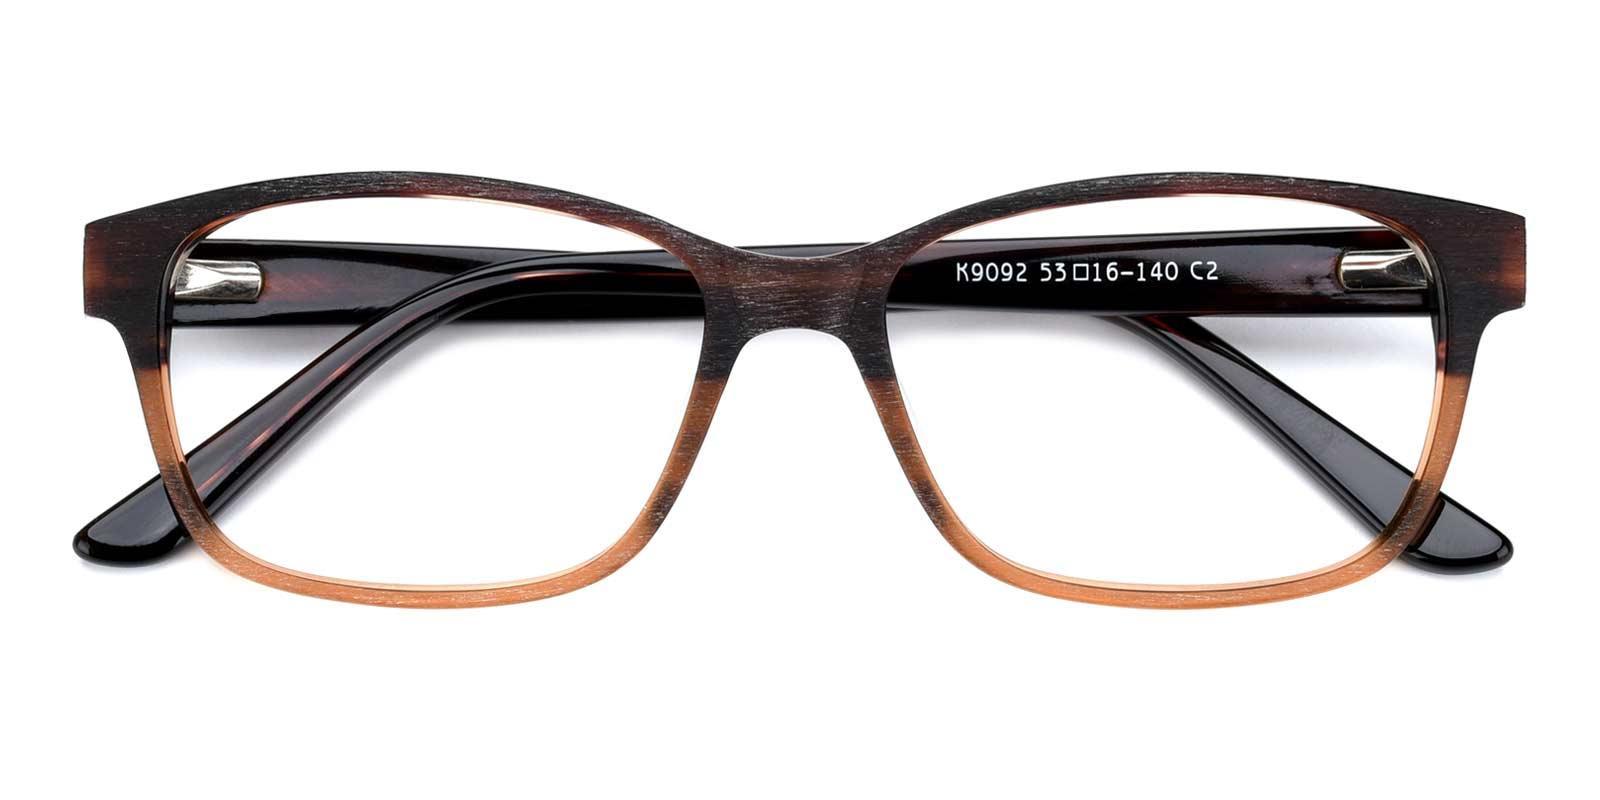 Prince-Brown-Rectangle-Acetate-Eyeglasses-detail